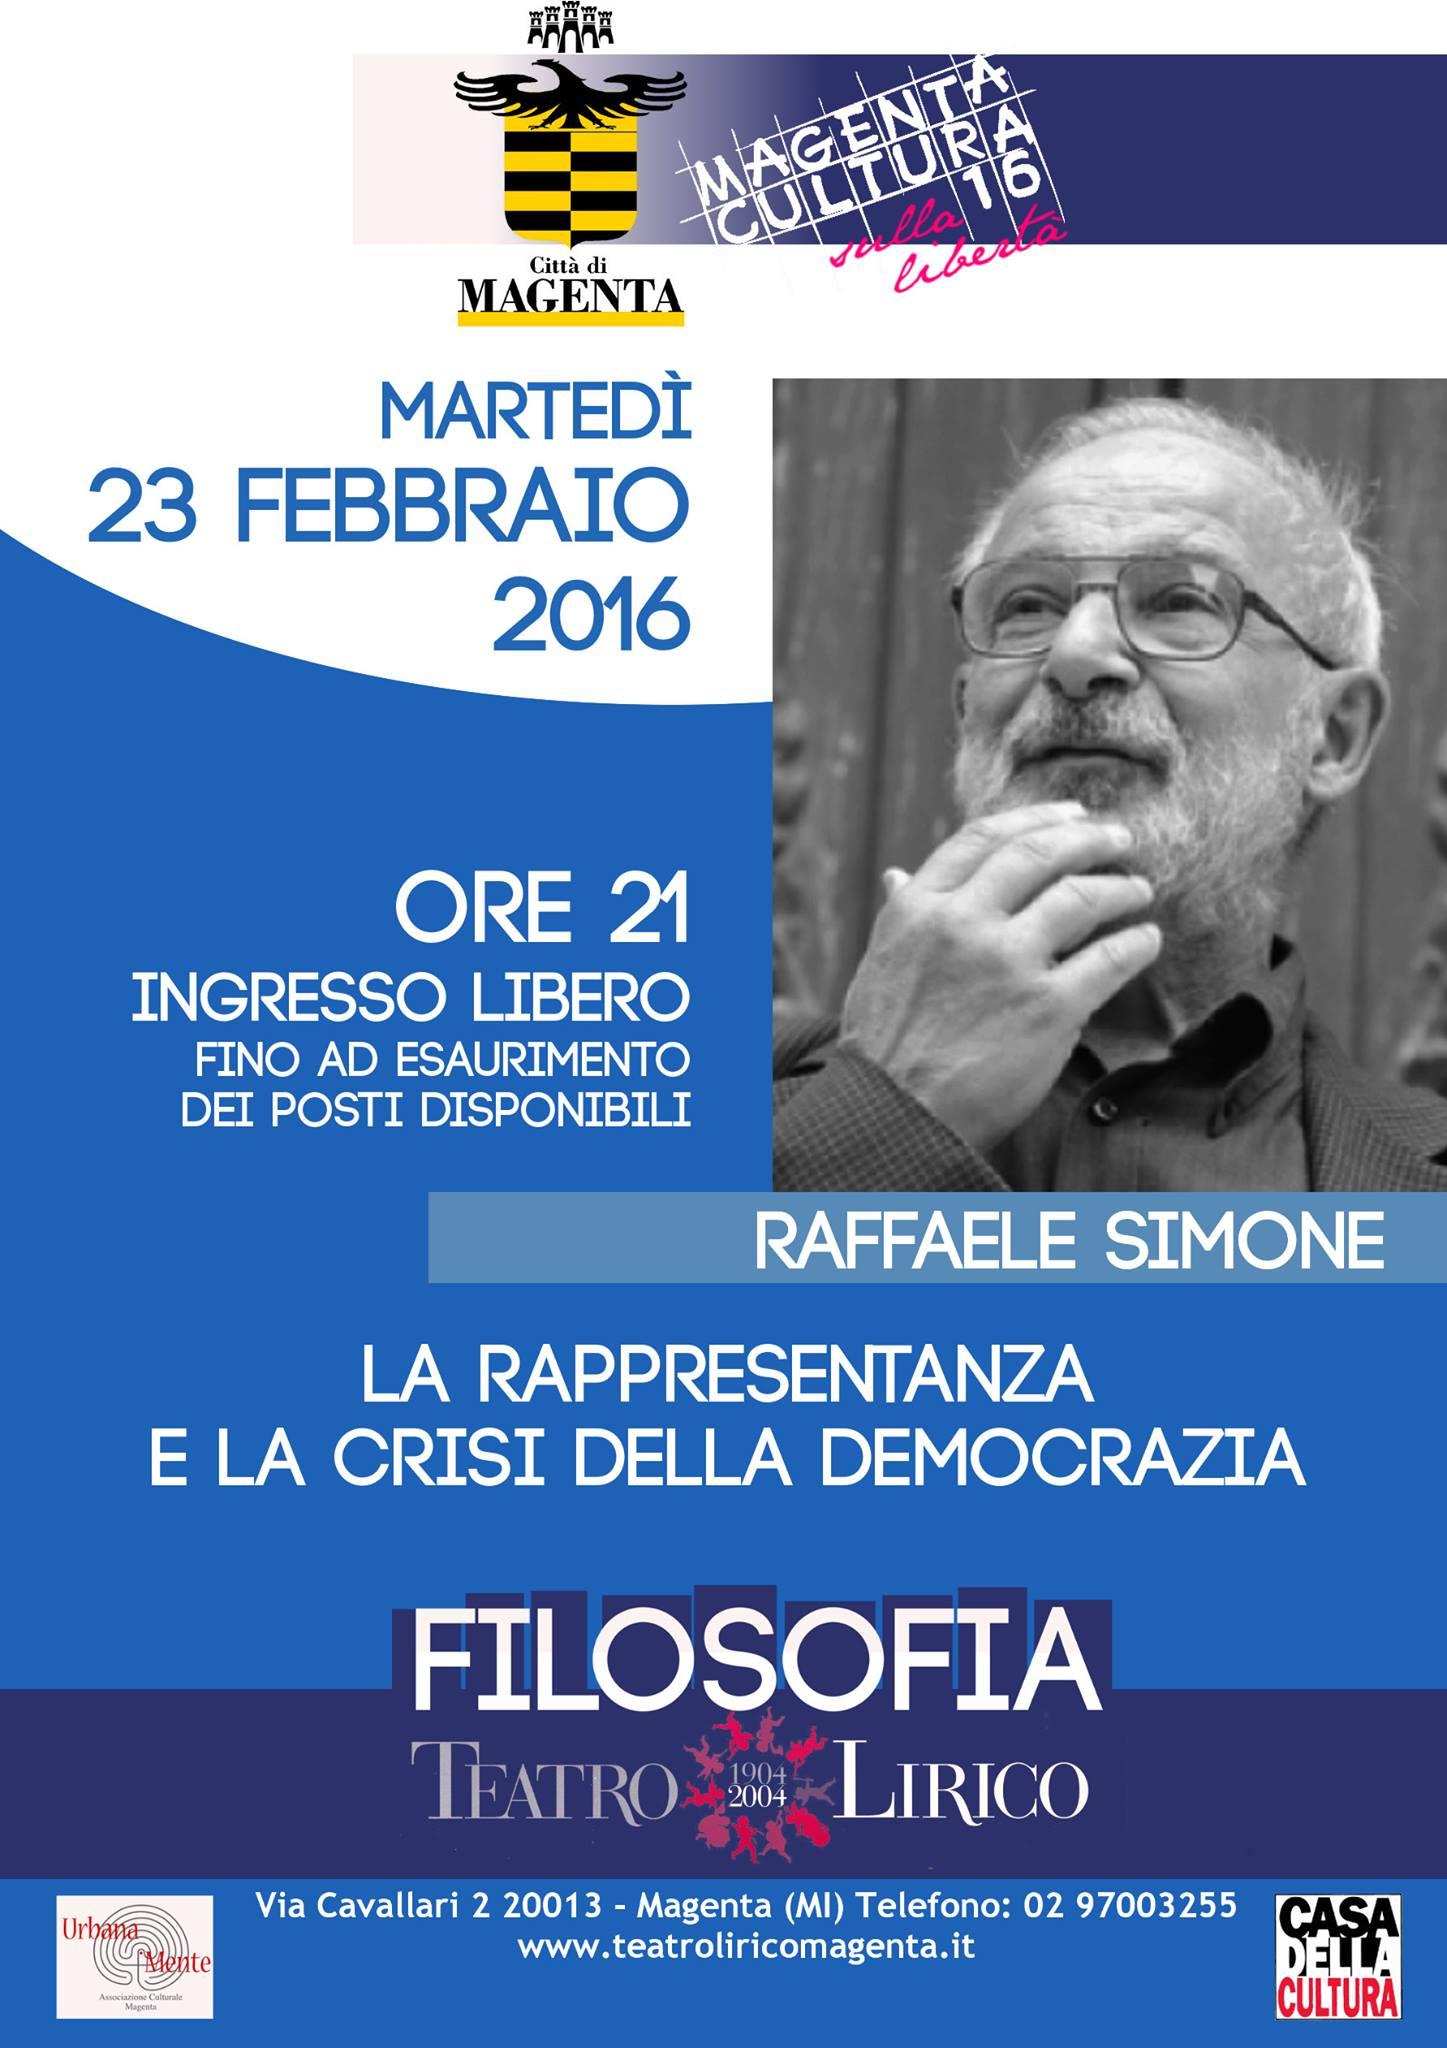 MagentaCultura2016_Raffaele De Simone_locandina